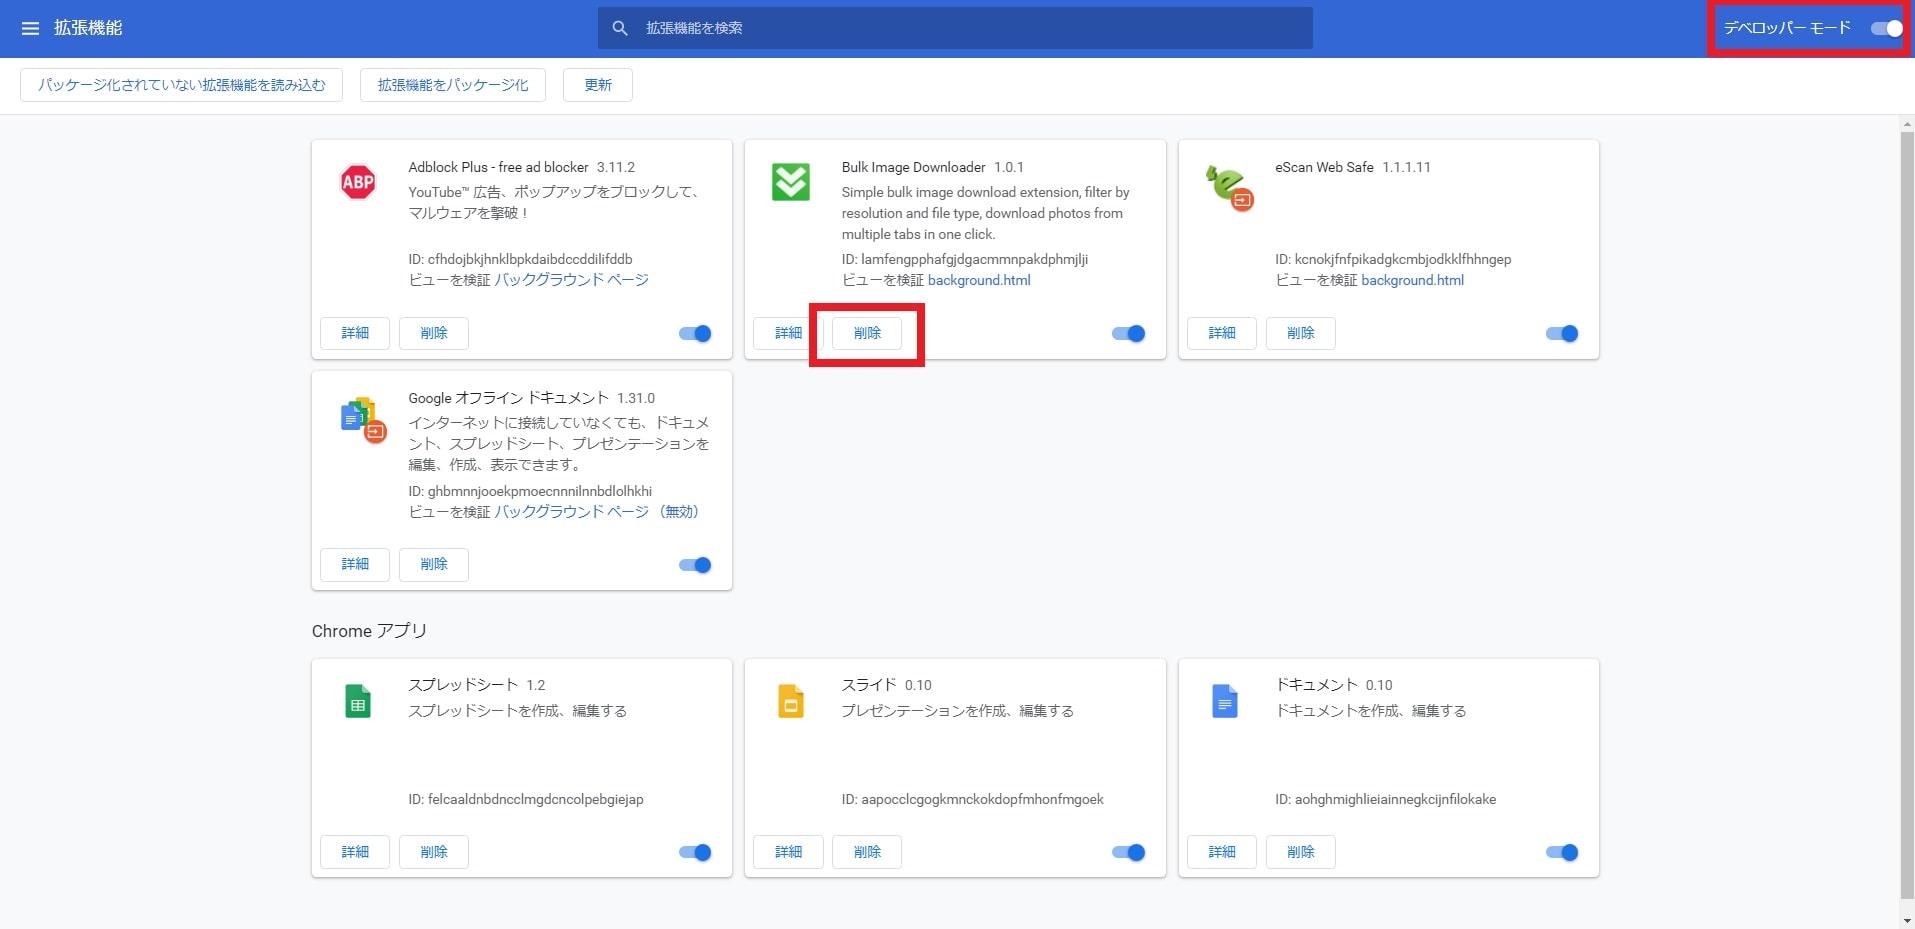 Google Cheomeの拡張機能の管理画面